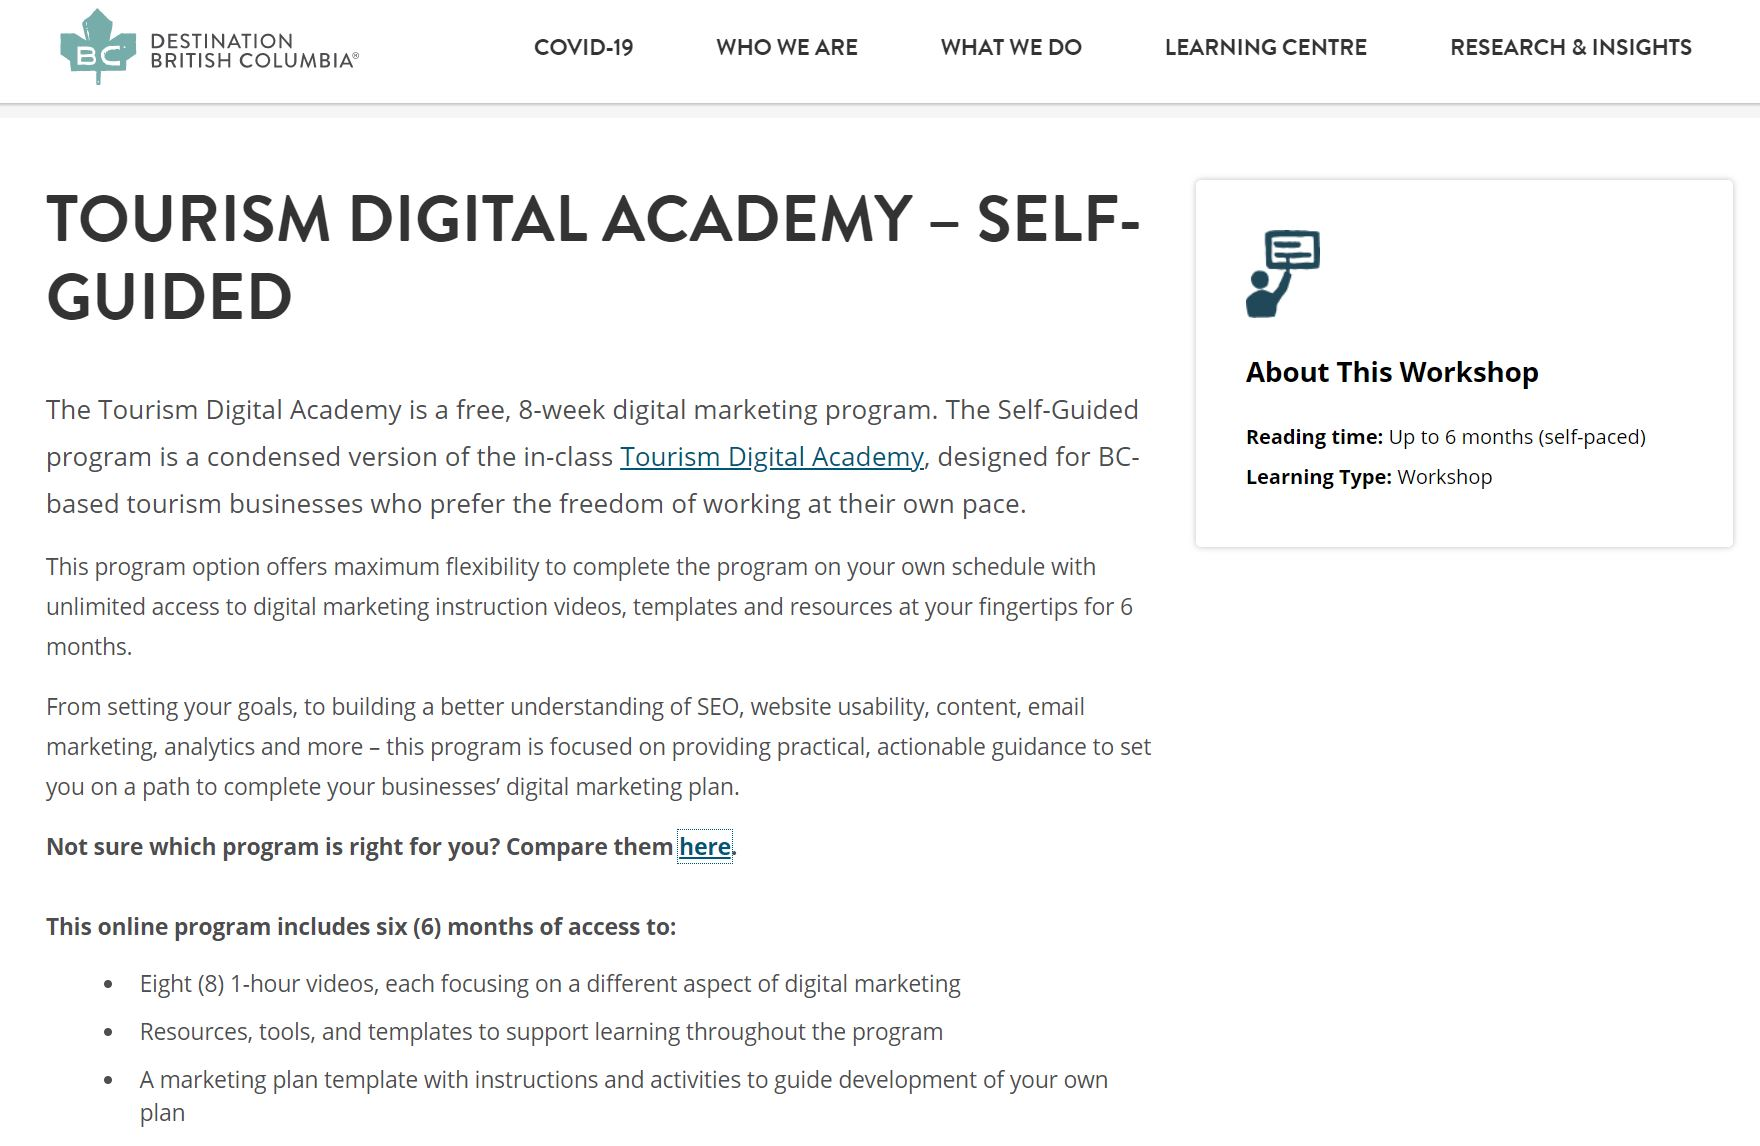 Tourism Digital Academy: Self-Guided